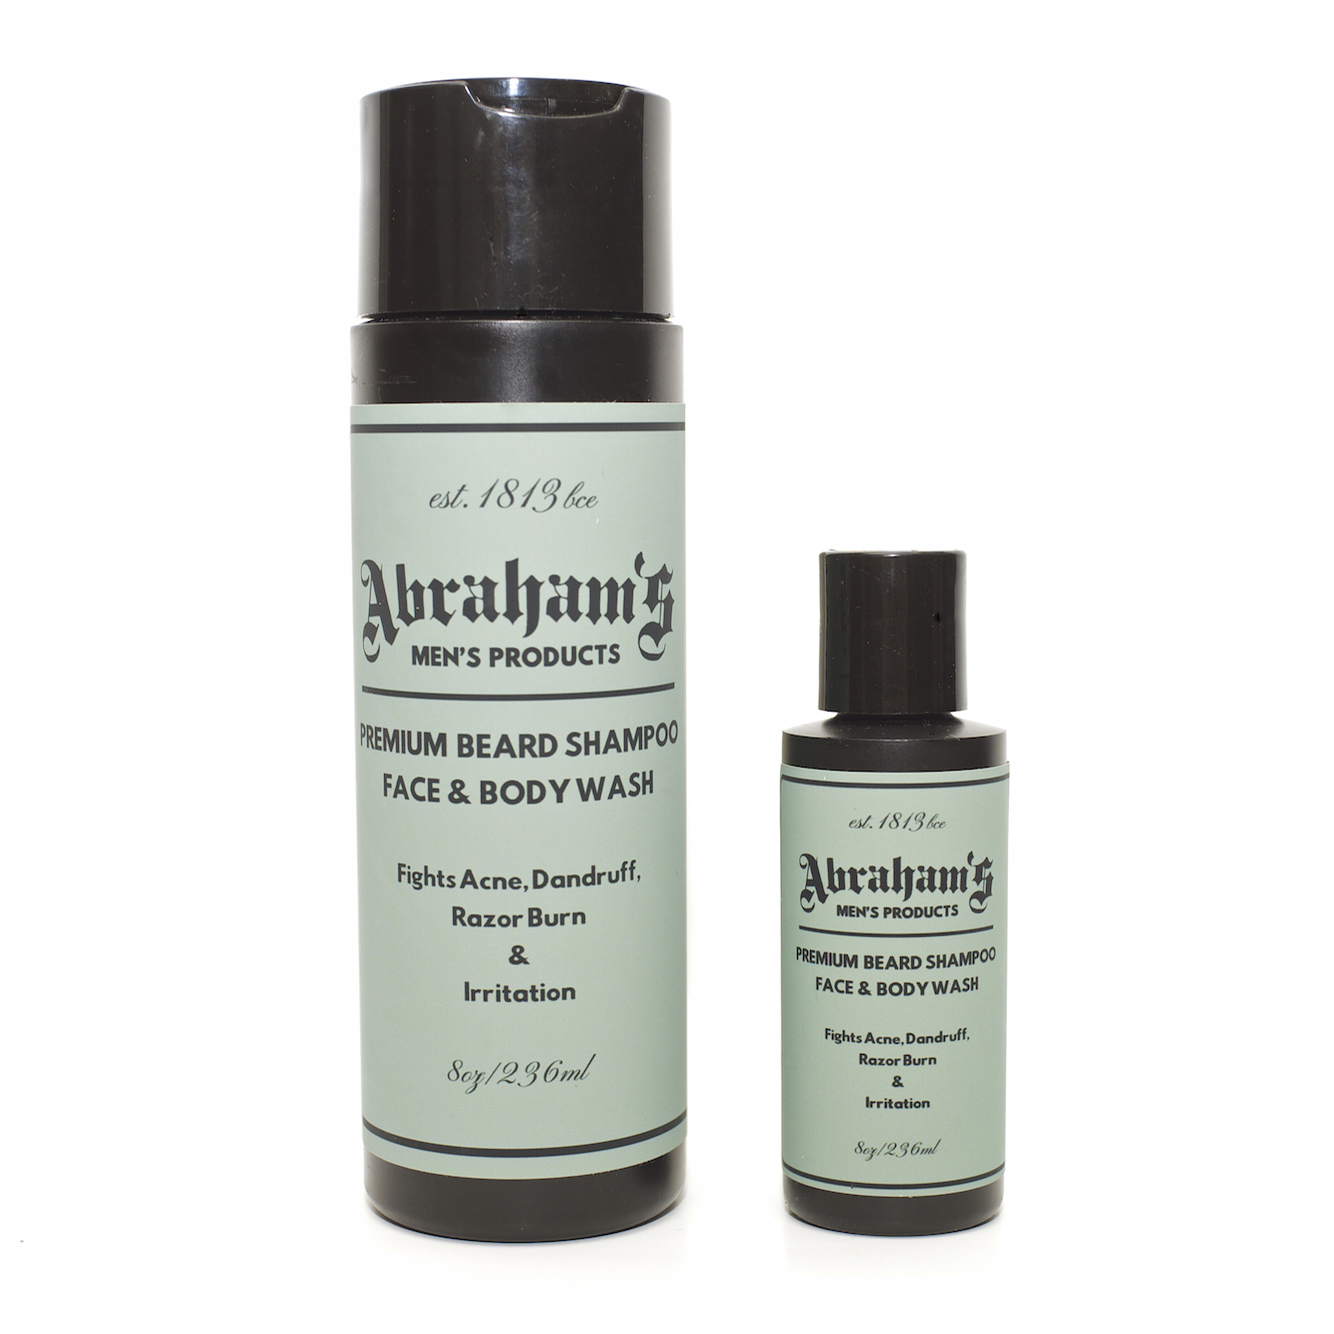 Premium Beard Shampoo, Face and Body Wash